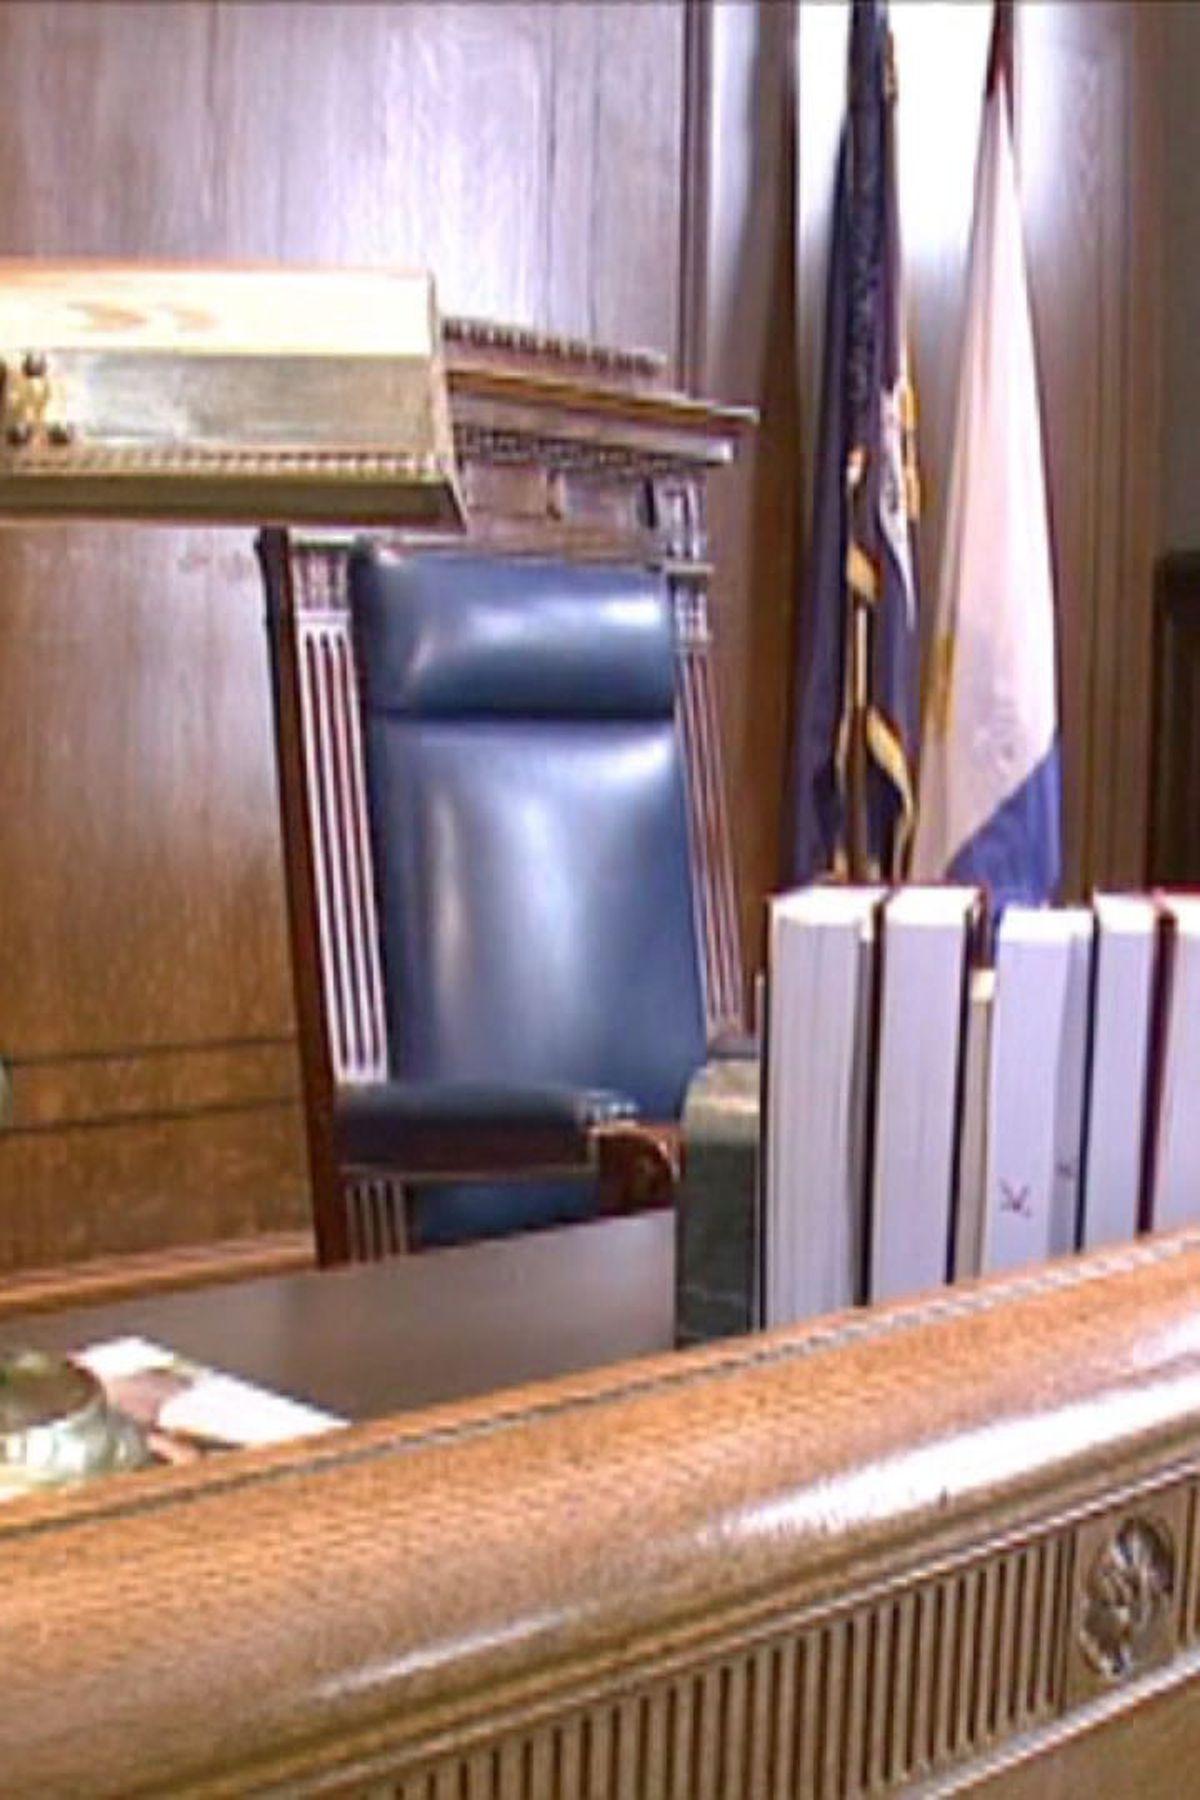 City Initiative to reduce jail population draws criticism over low bonds